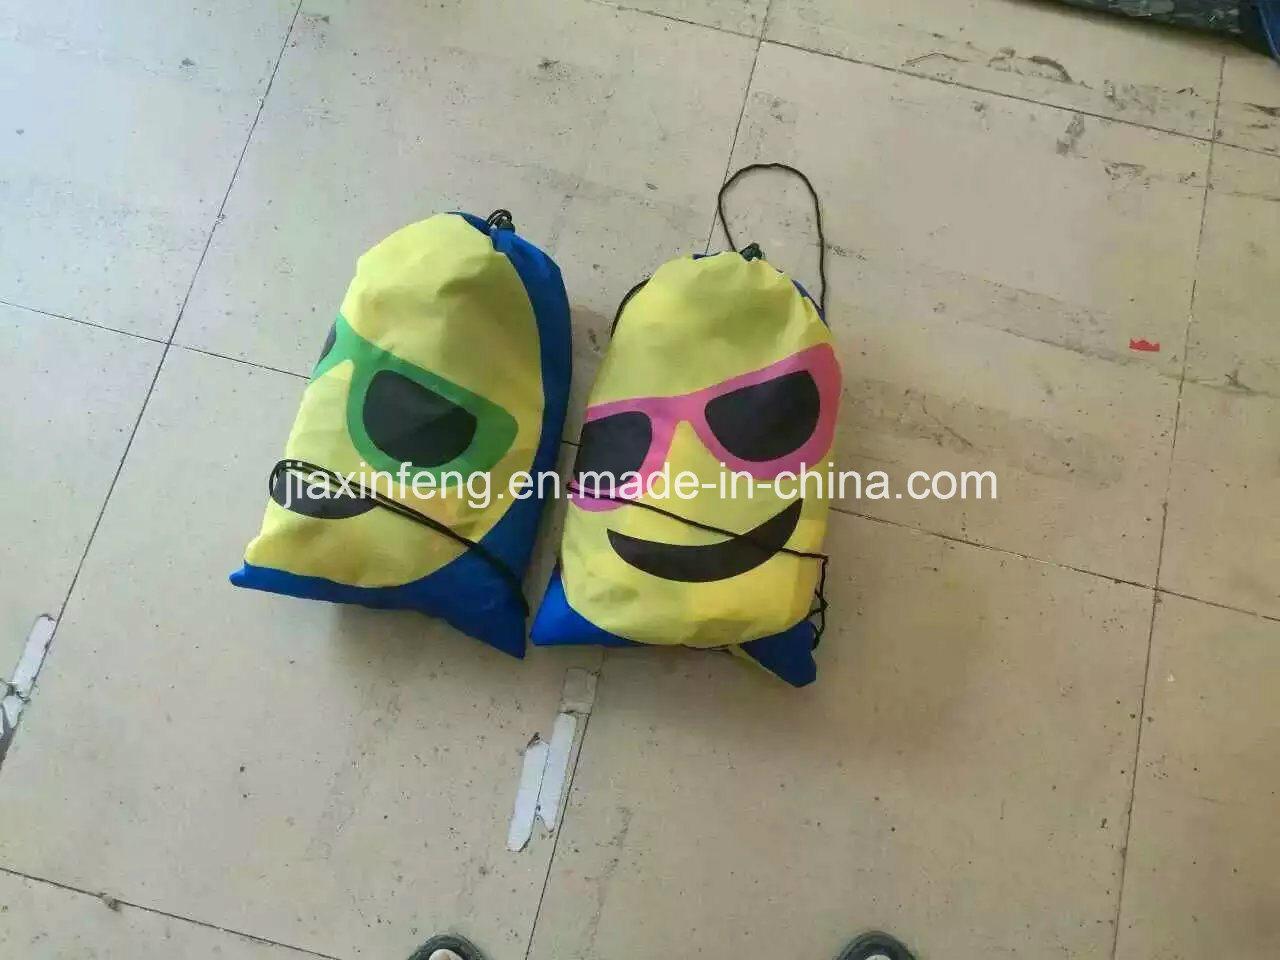 Inflatable Air Sleeping Bag Travelling Camping Laybag Inflatable Sofa Banaba Sleeping Bag